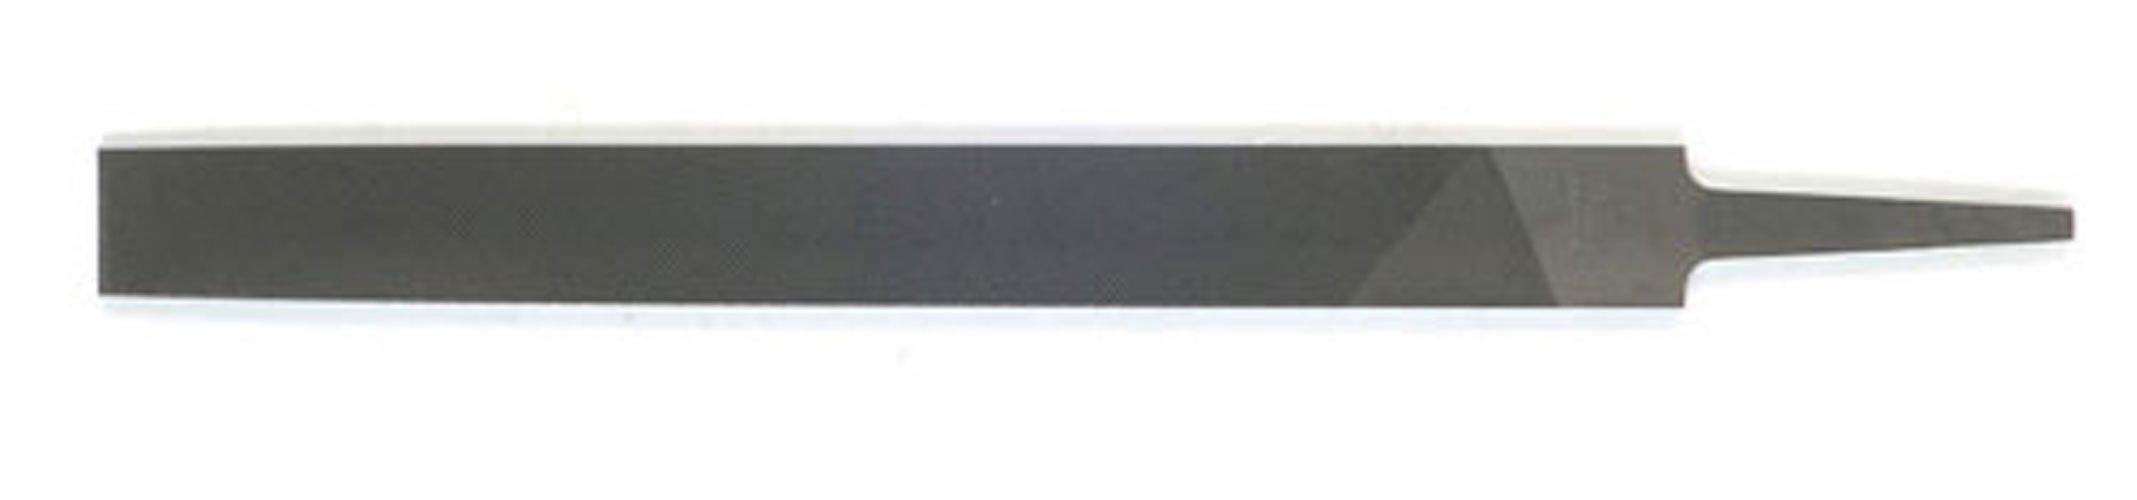 Metal work File Medium Flat 200mm